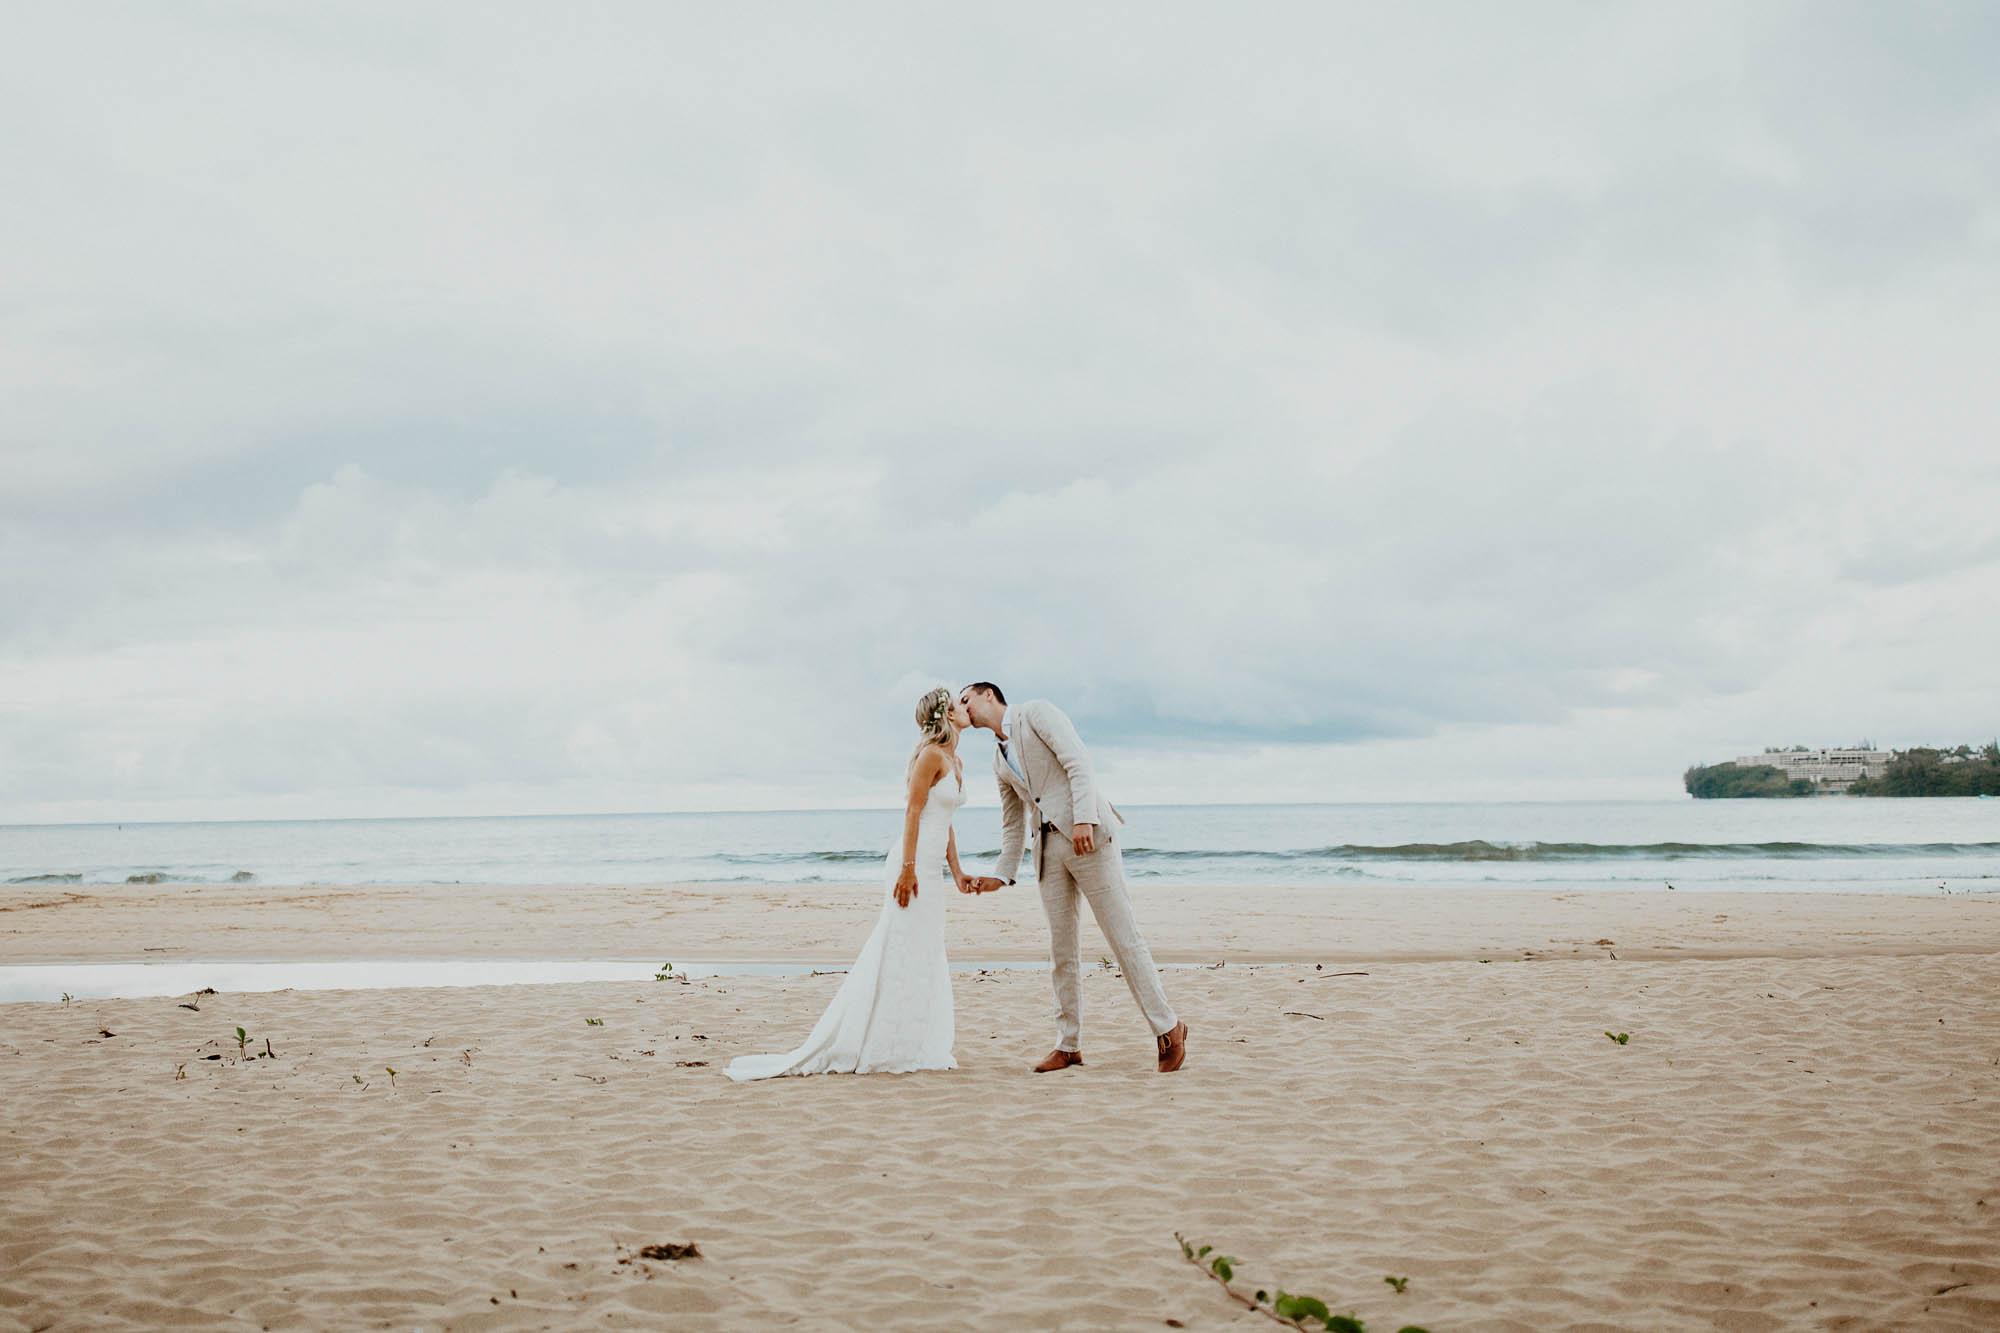 Wedding photos on hanalei bay beach north shore kauai hawaii